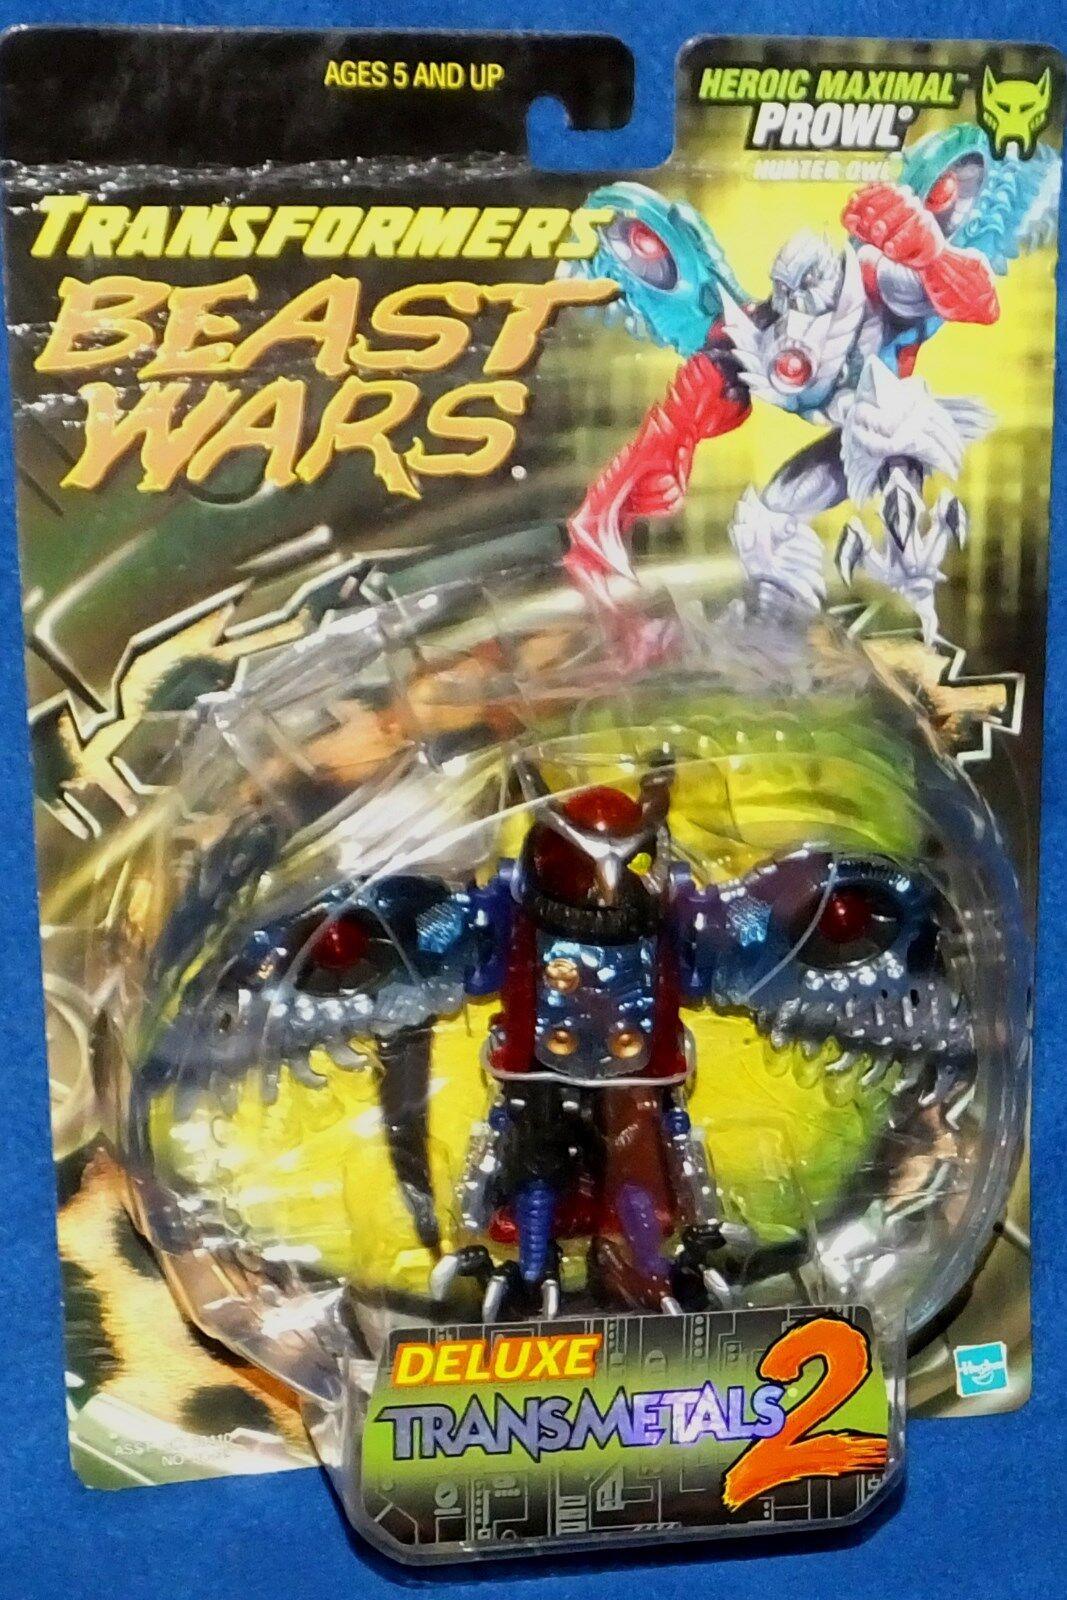 Transformers Beast Wars Heroic Maximal Transmetal 2 Prowl Nuovo 1999 Factory Seal